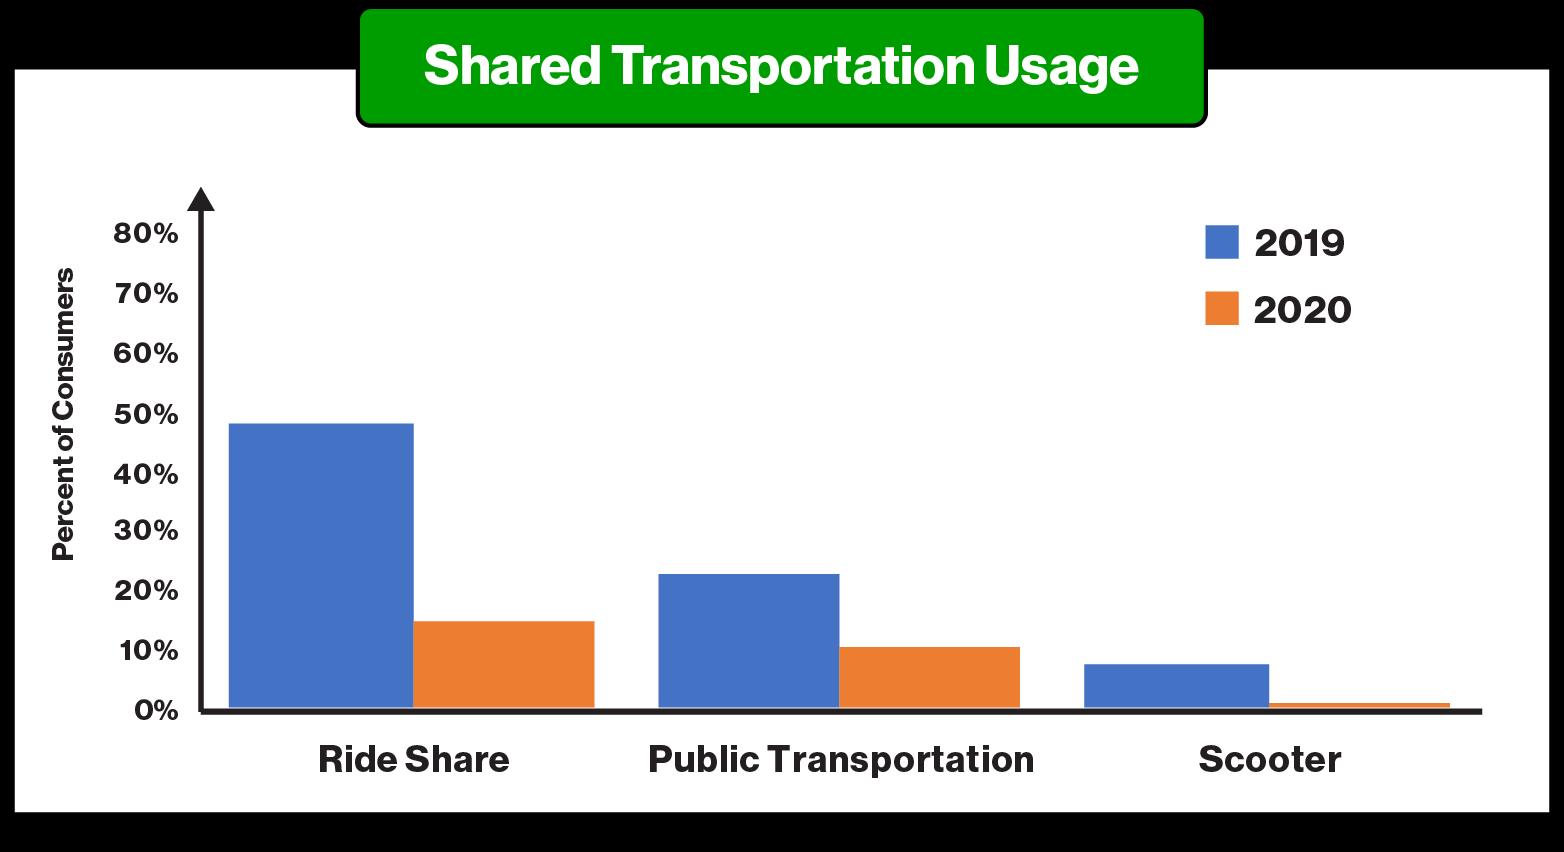 COVID Article JAN 2021_DeclineSharedTransportationUsage - ParkMobile